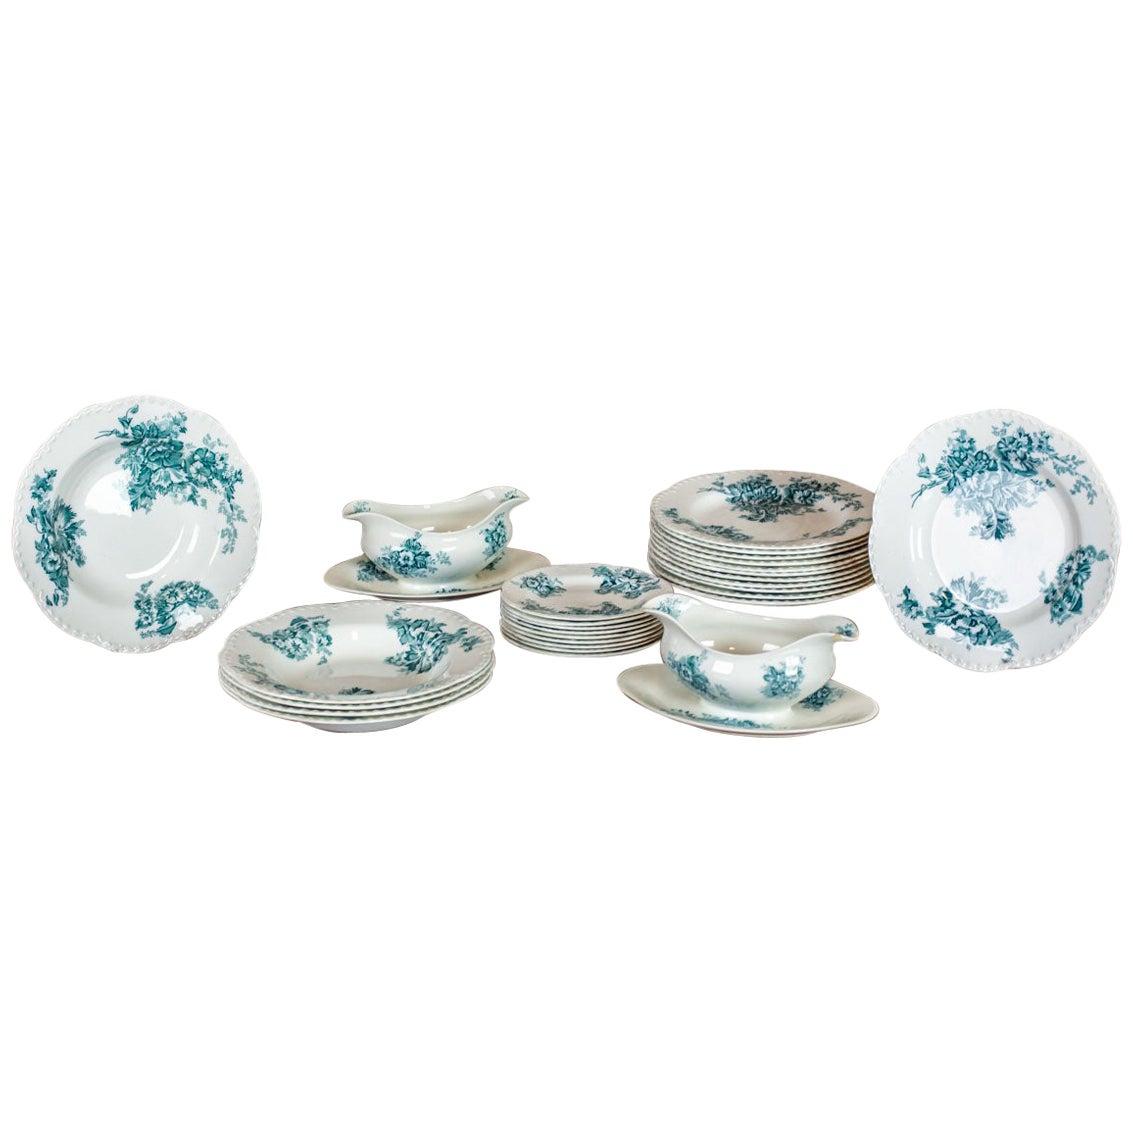 20th Century Johnson Brothers Anemone Porcelain Set